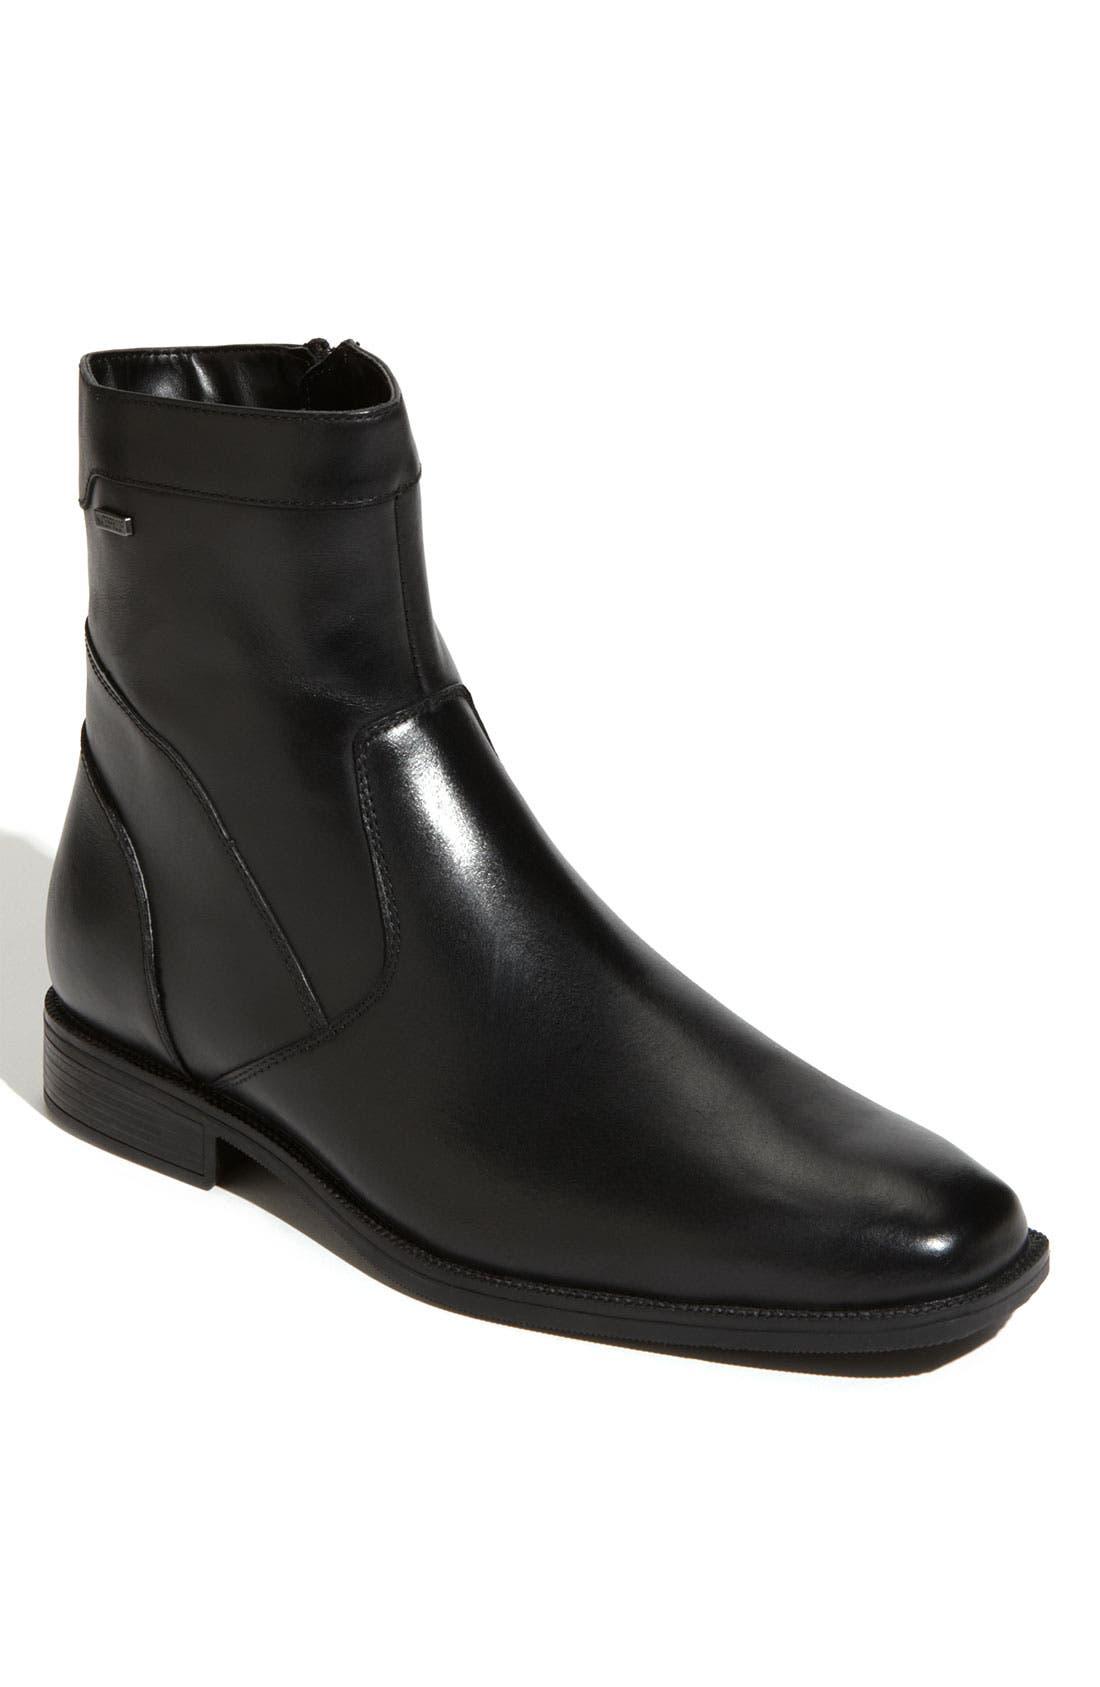 Alternate Image 1 Selected - Blondo 'Valerio' Waterproof Boot (Men)